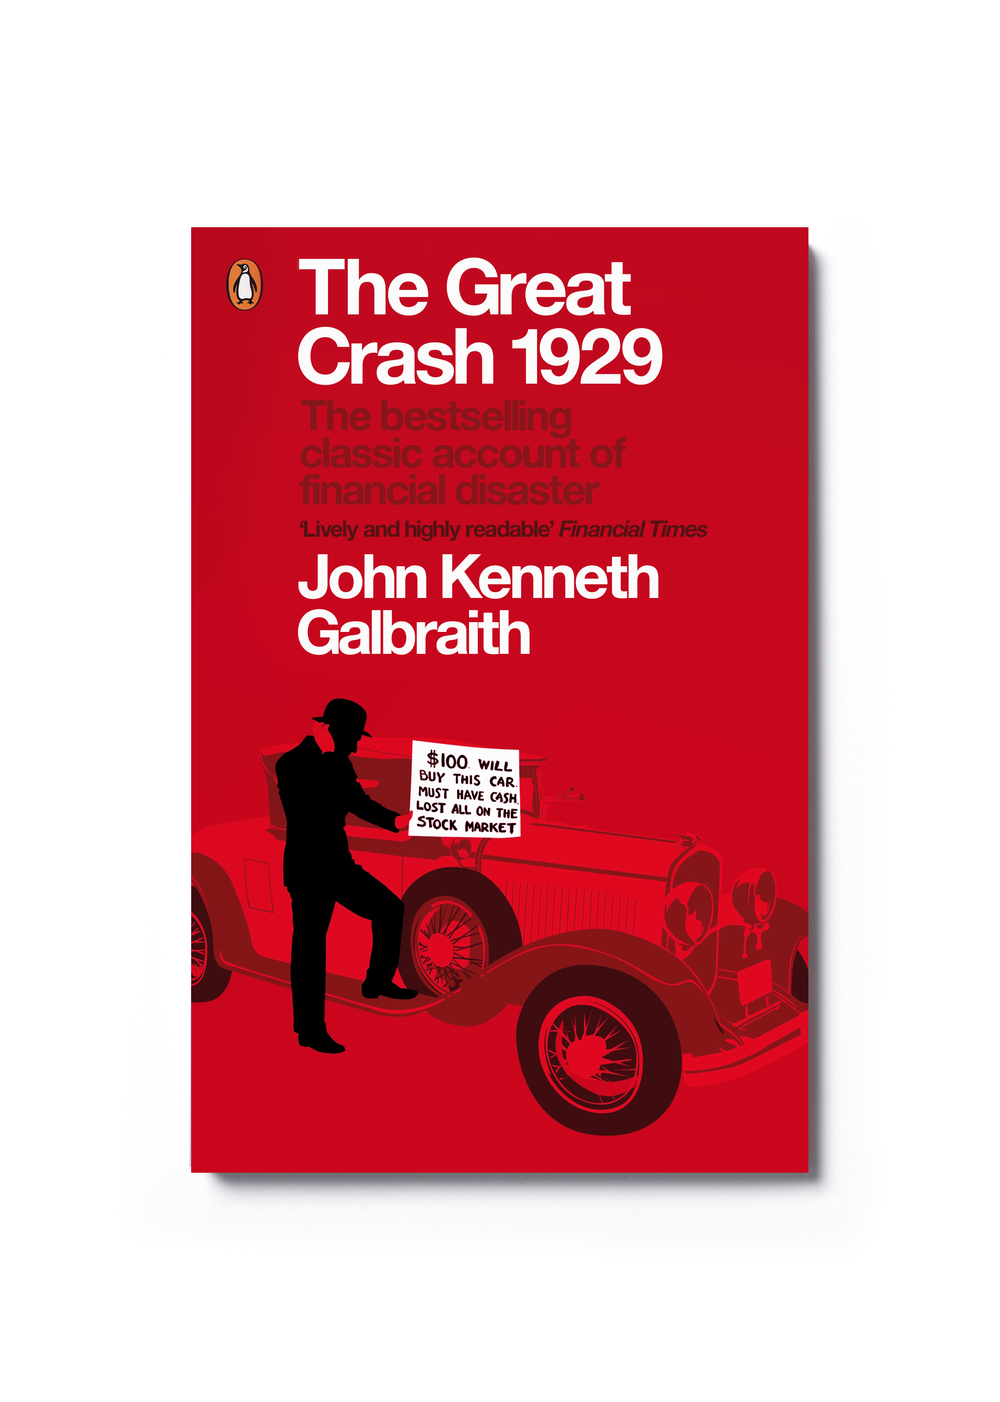 The Great Crash by John Kenneth Galbraith - Design & illustration: Jim Stoddart